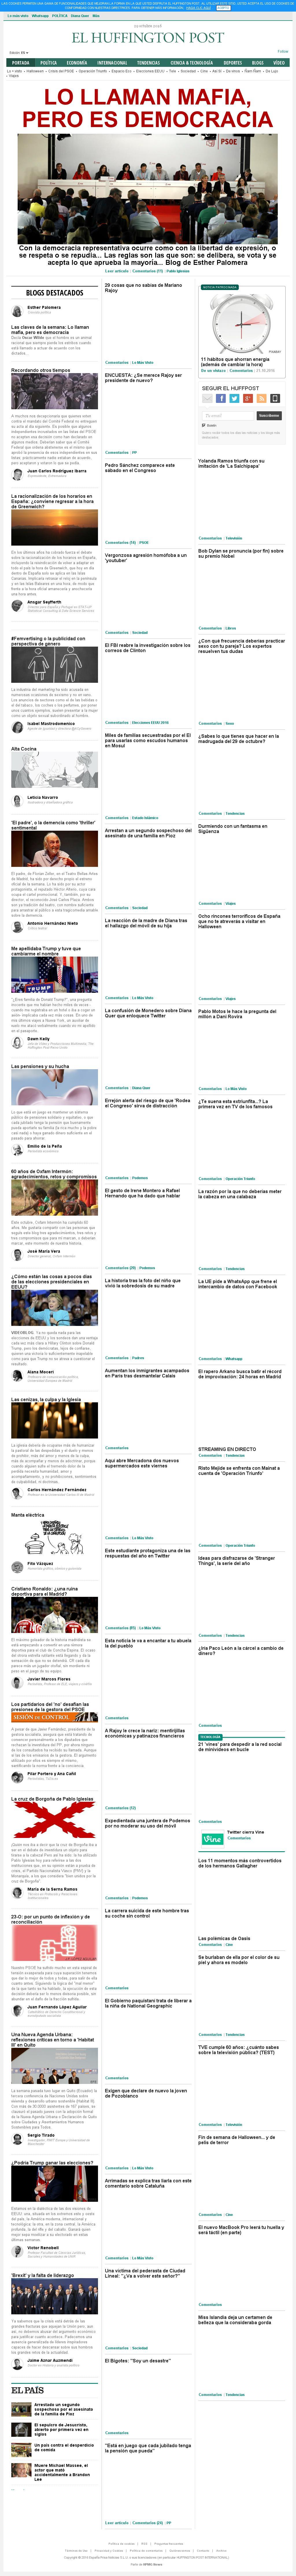 El Huffington Post (Spain) at Saturday Oct. 29, 2016, 10:05 a.m. UTC